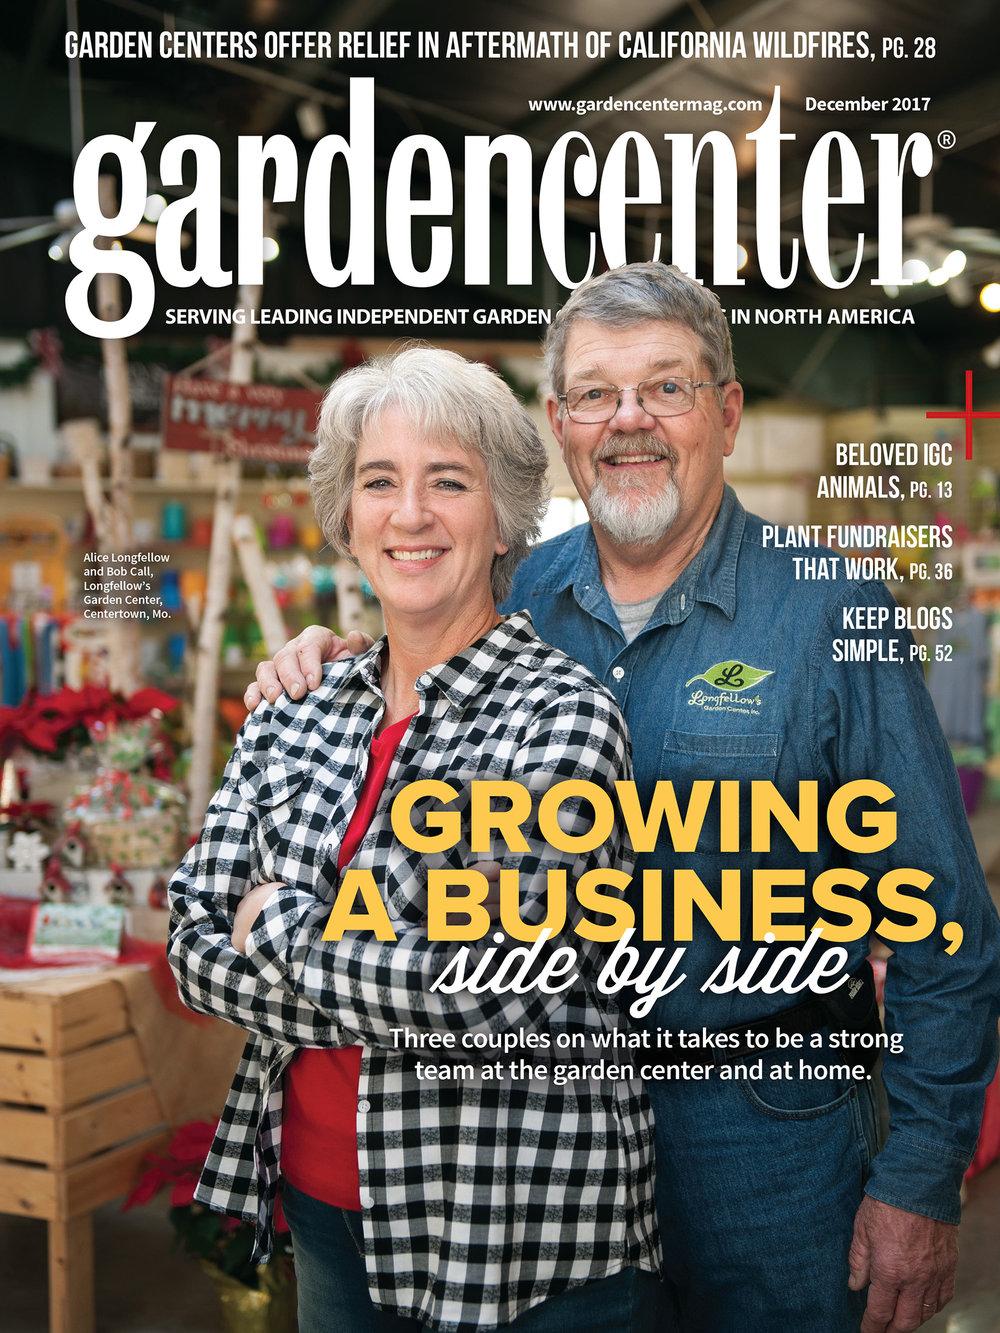 GardenCenterMagCover